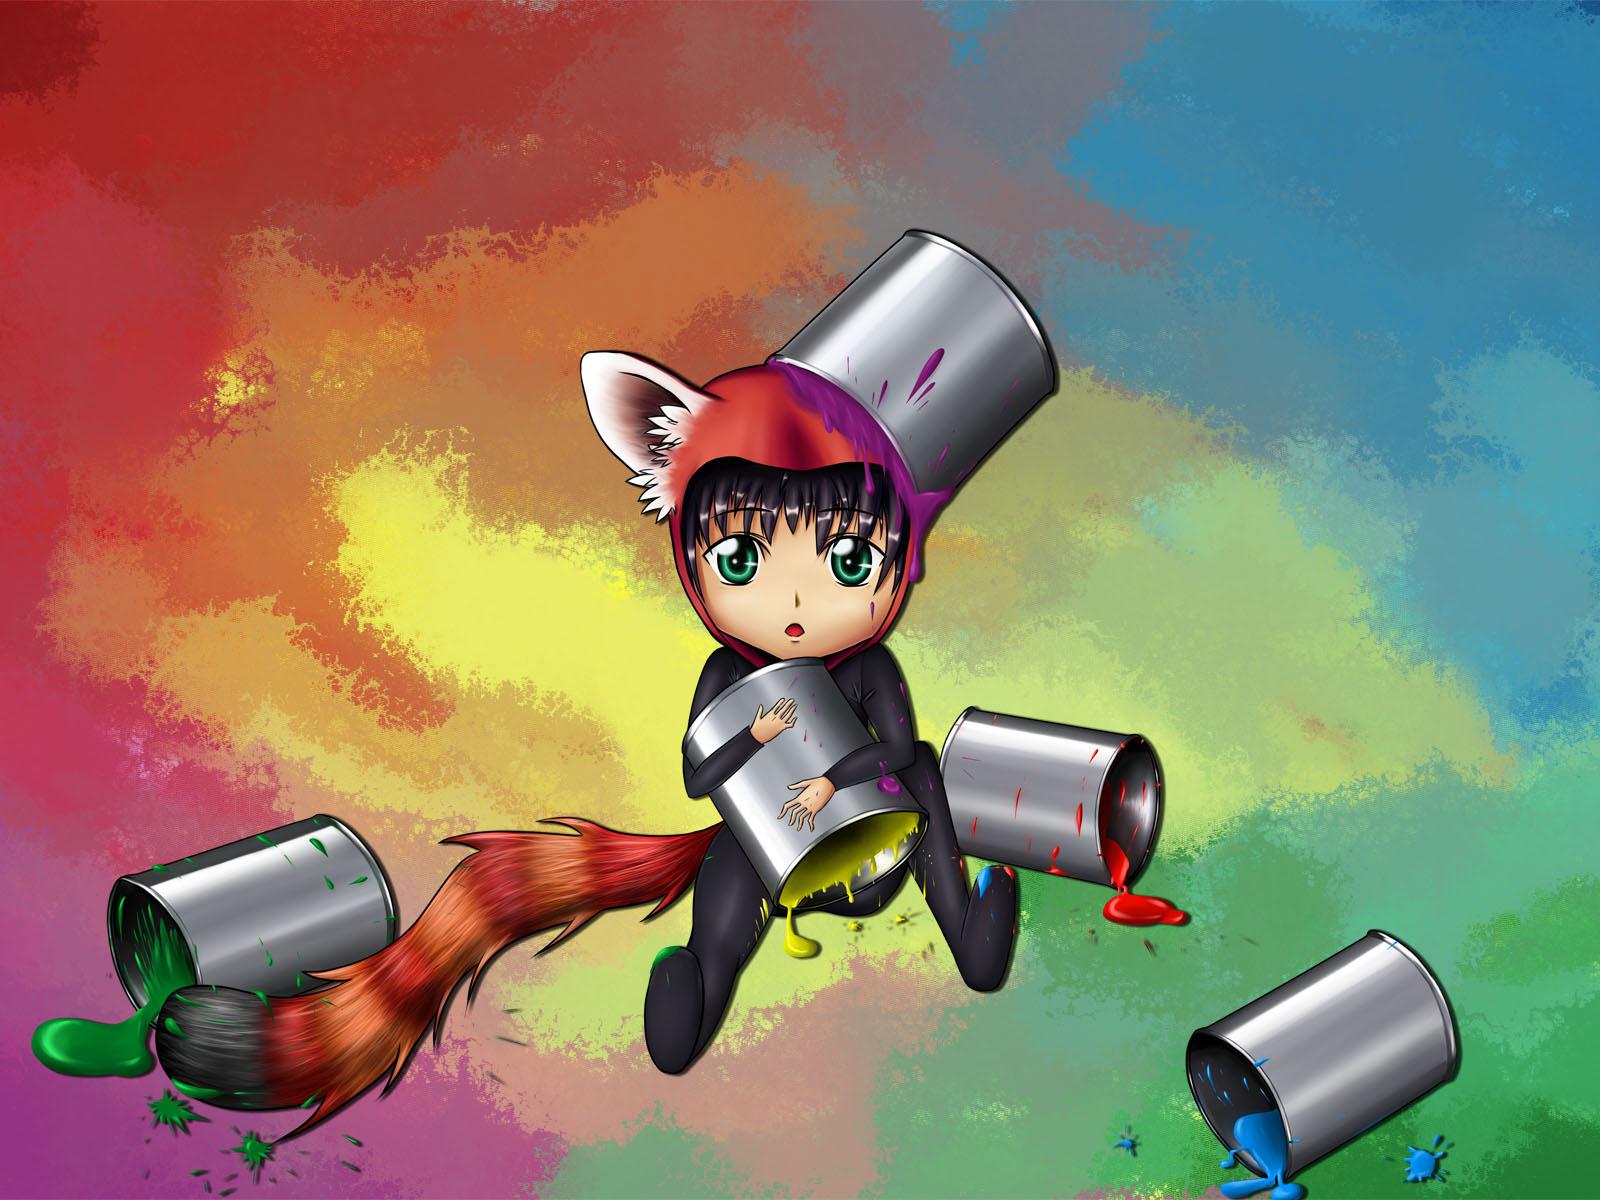 Jd_Paint1600x1200.jpg